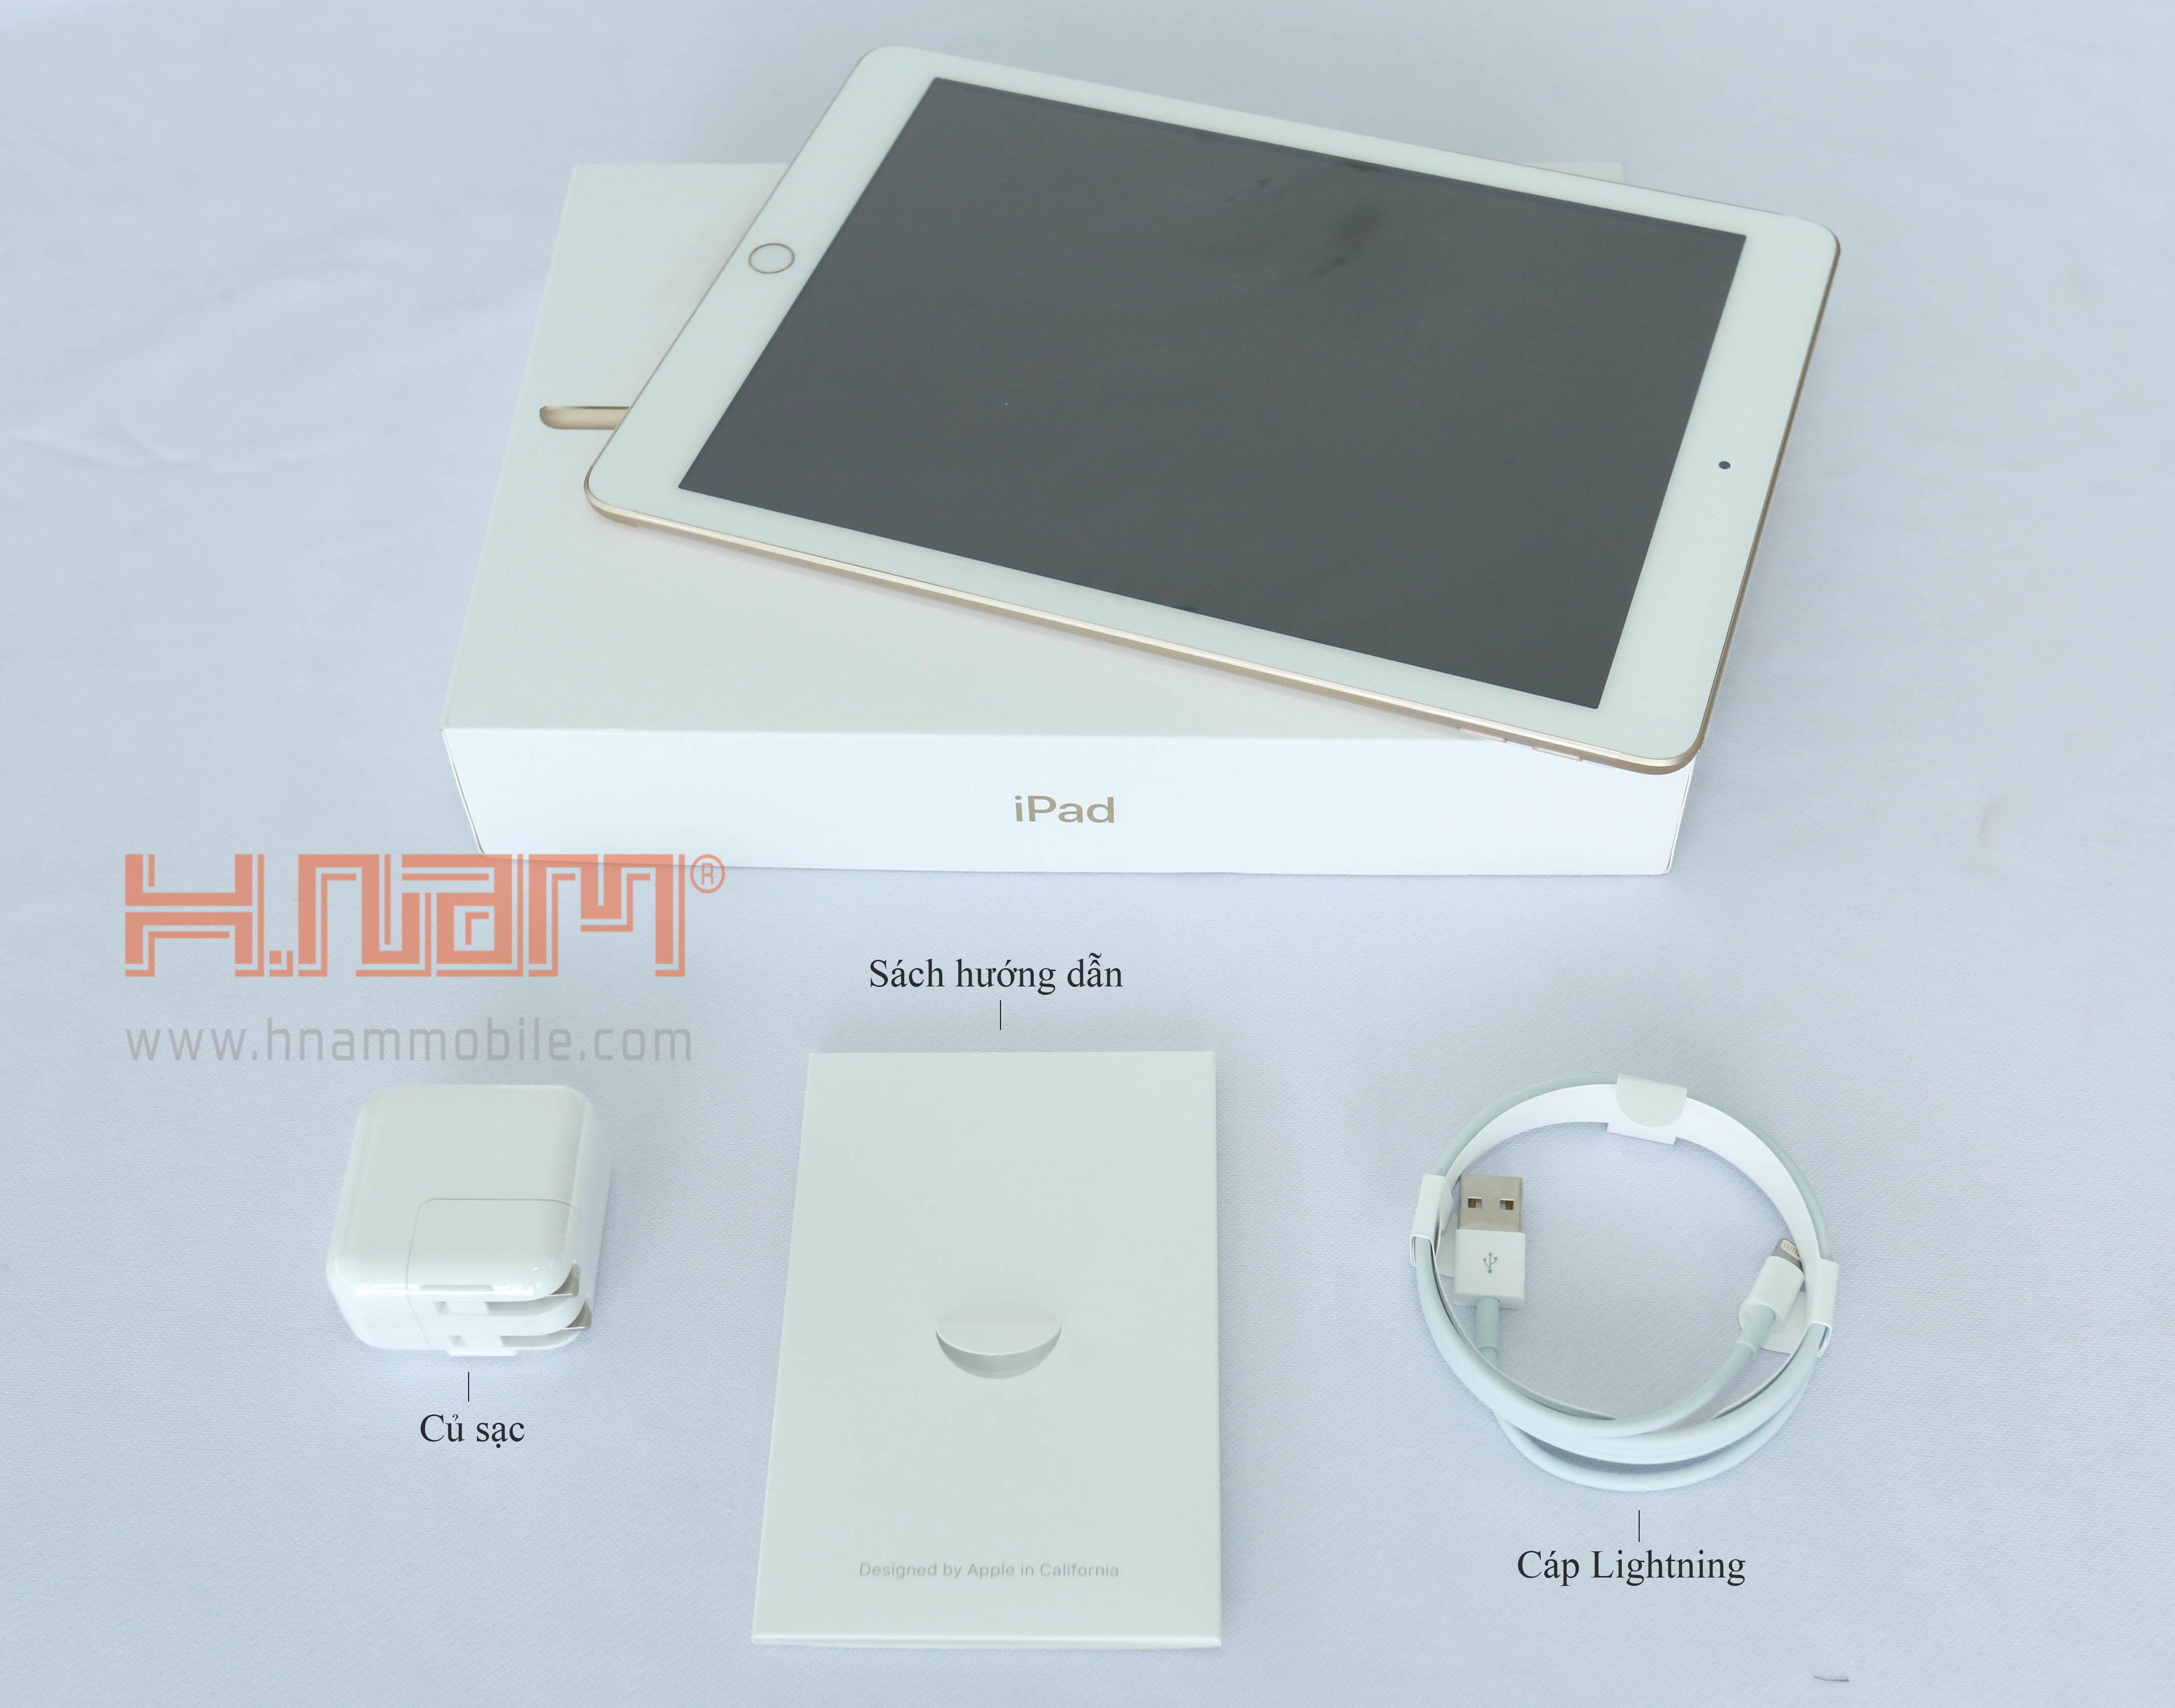 Apple iPad Gen 5 (2017) Wifi 32Gb hình sản phẩm 0